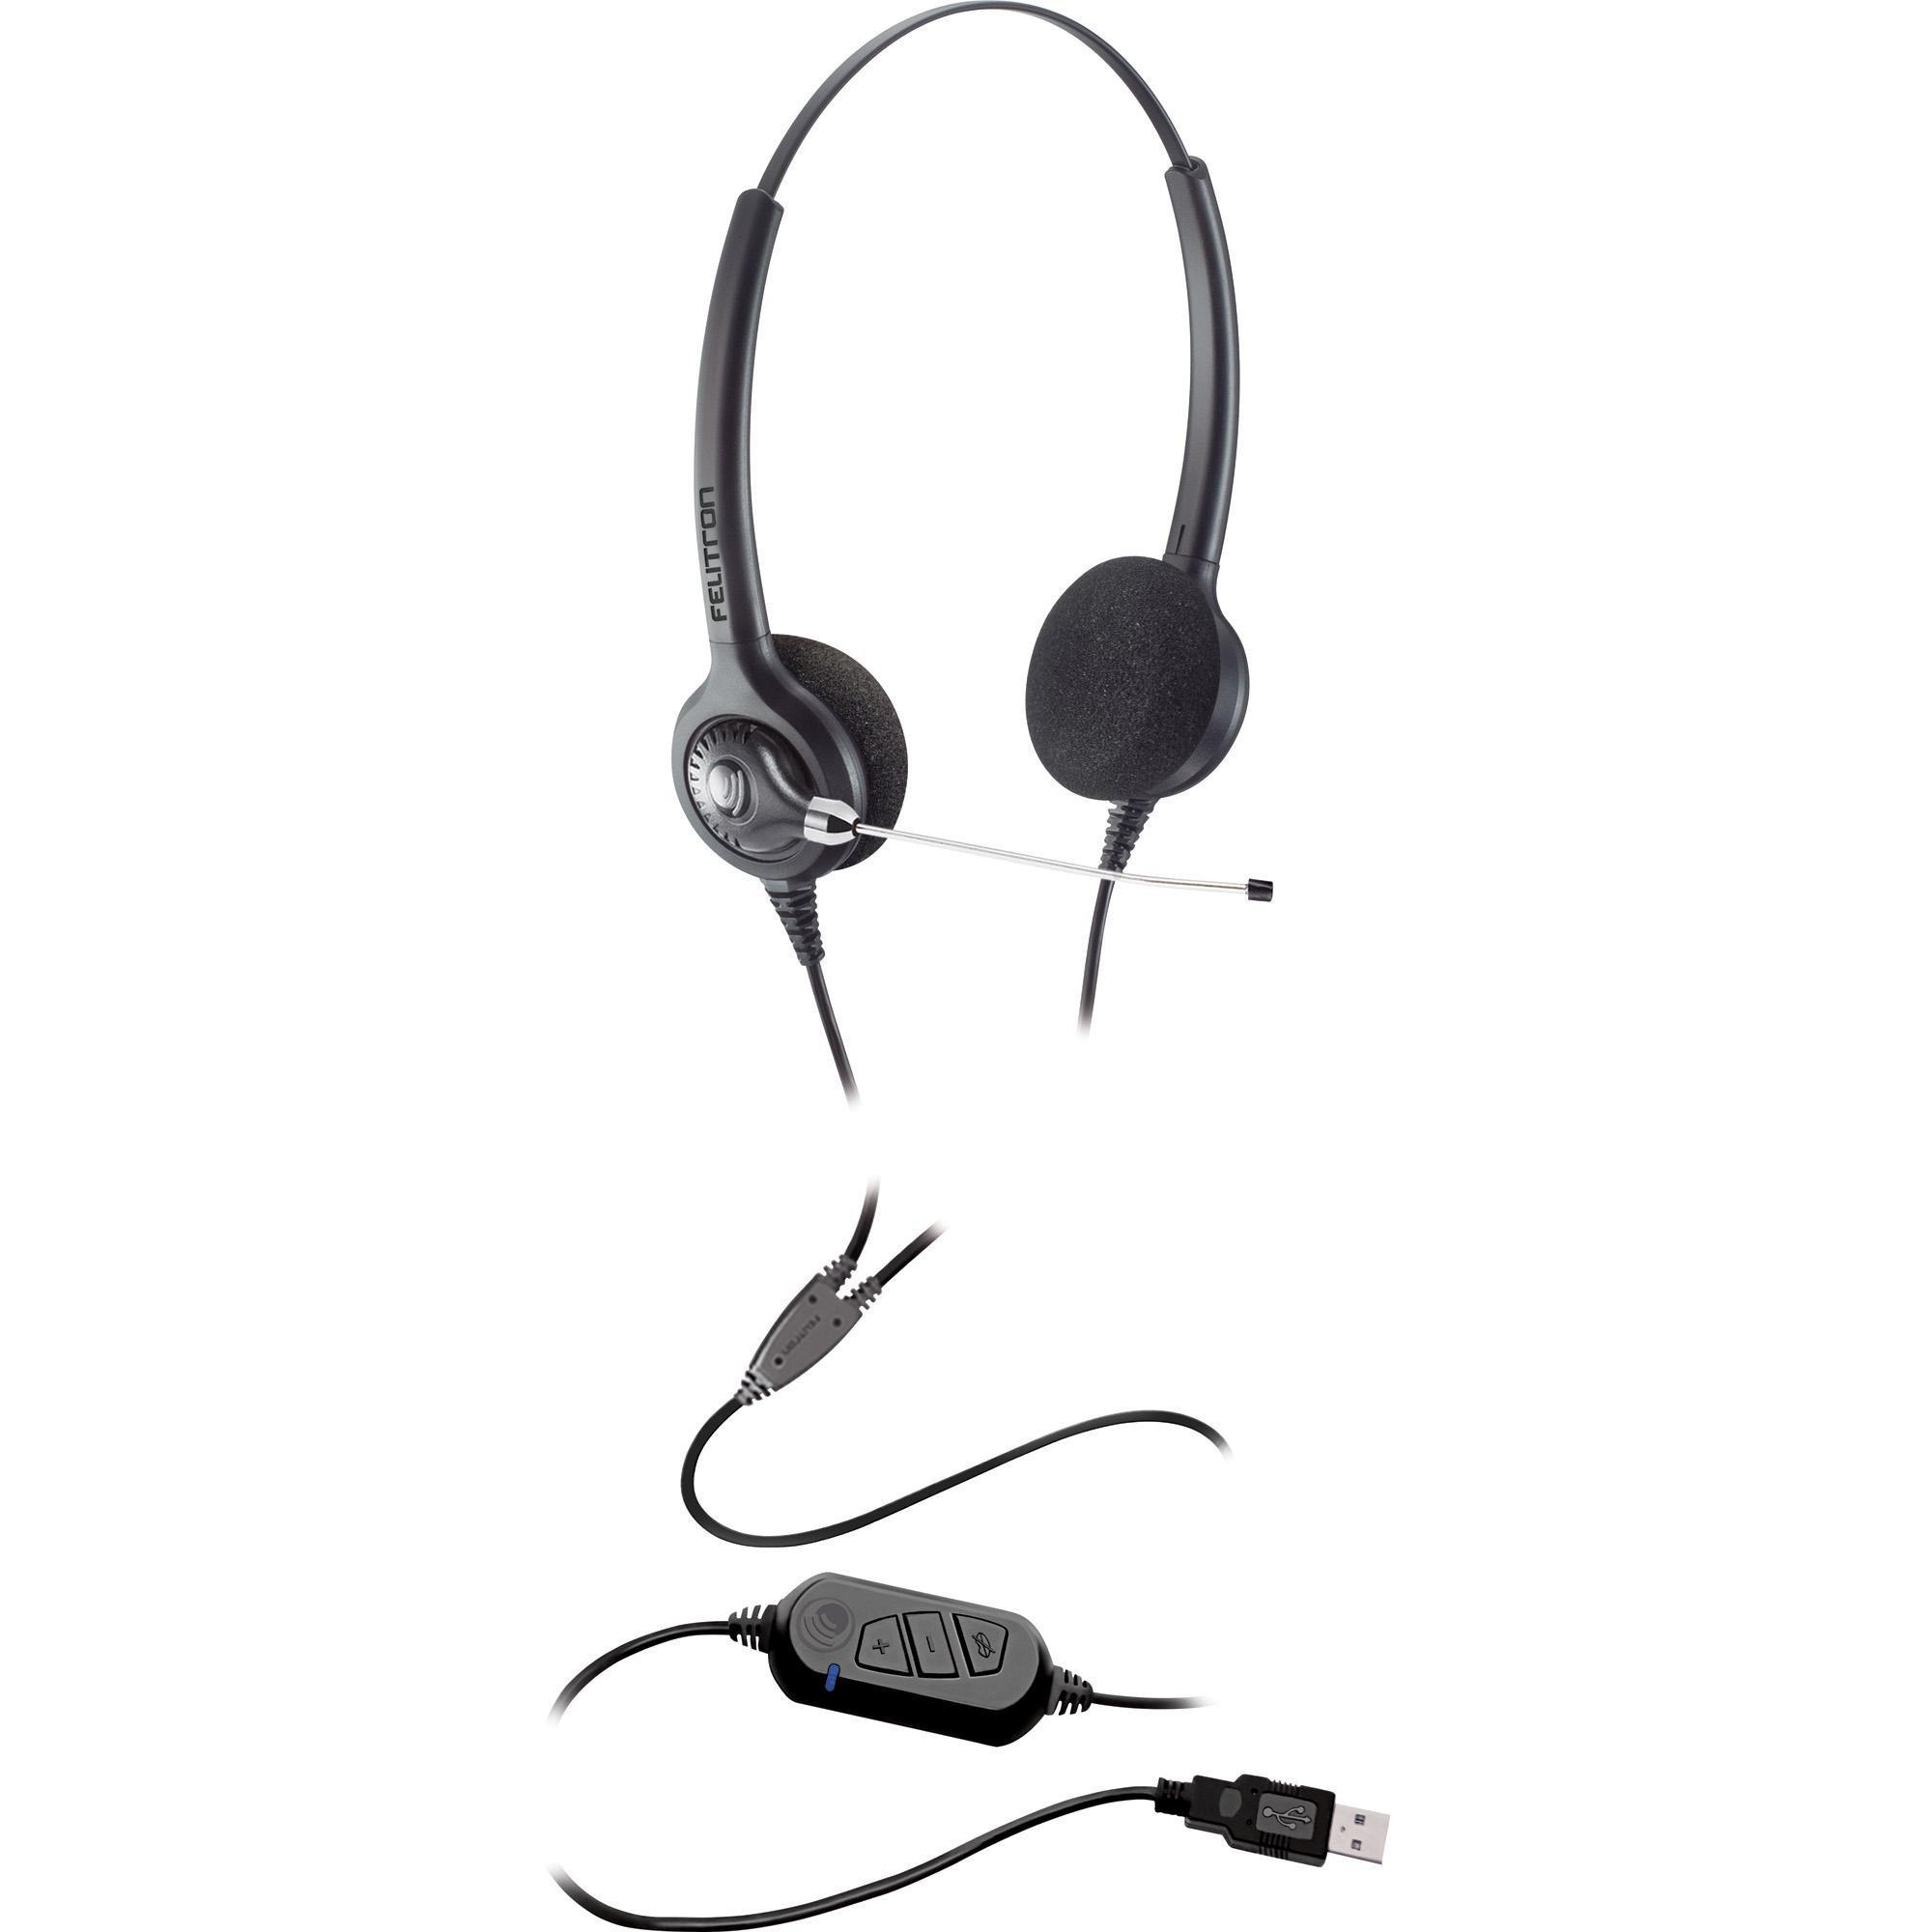 headset biauricular novo felitron epko compact 49341 2000 200152